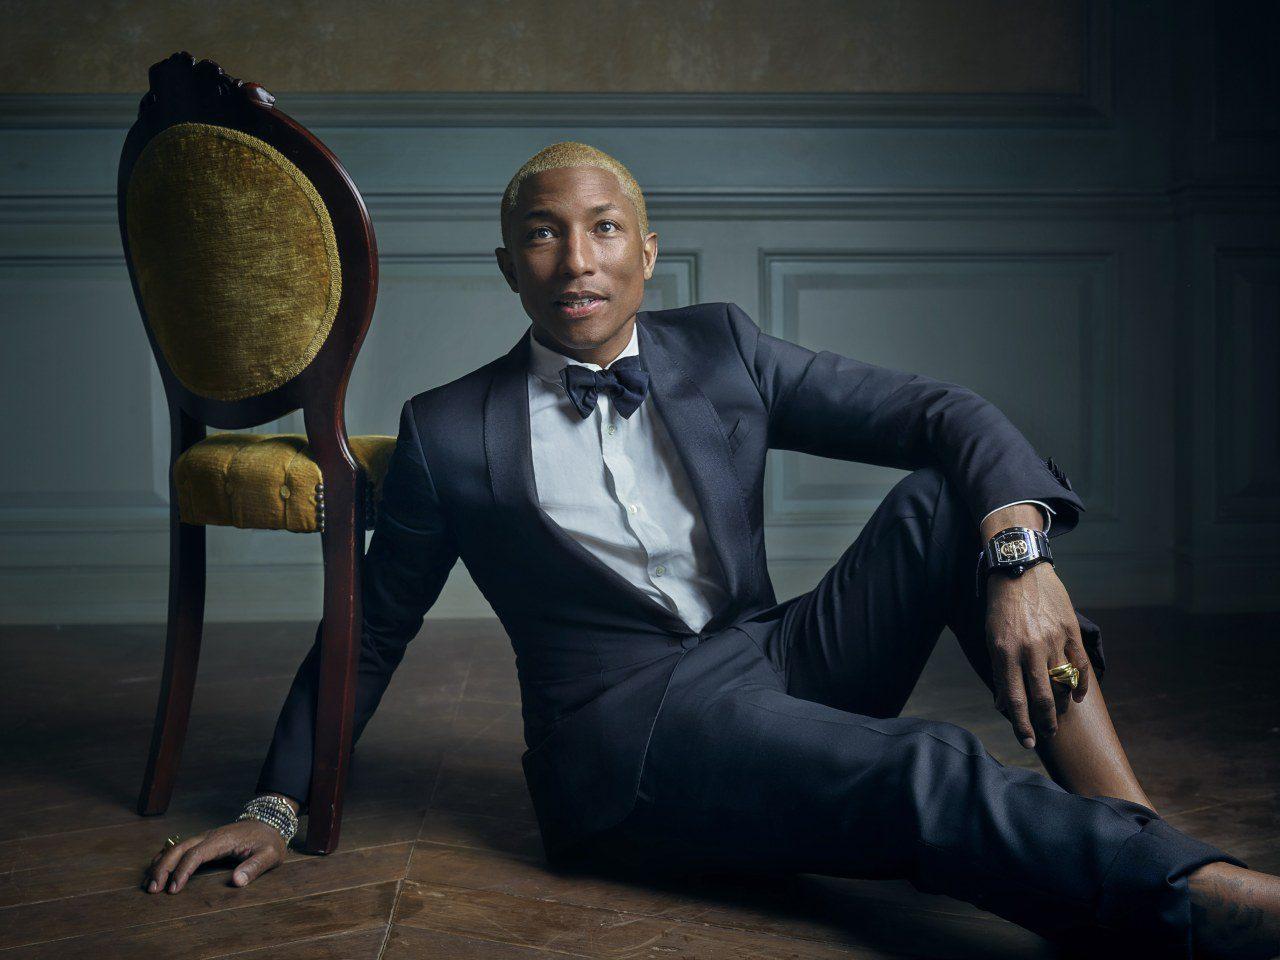 Modelo masculino sentado poses